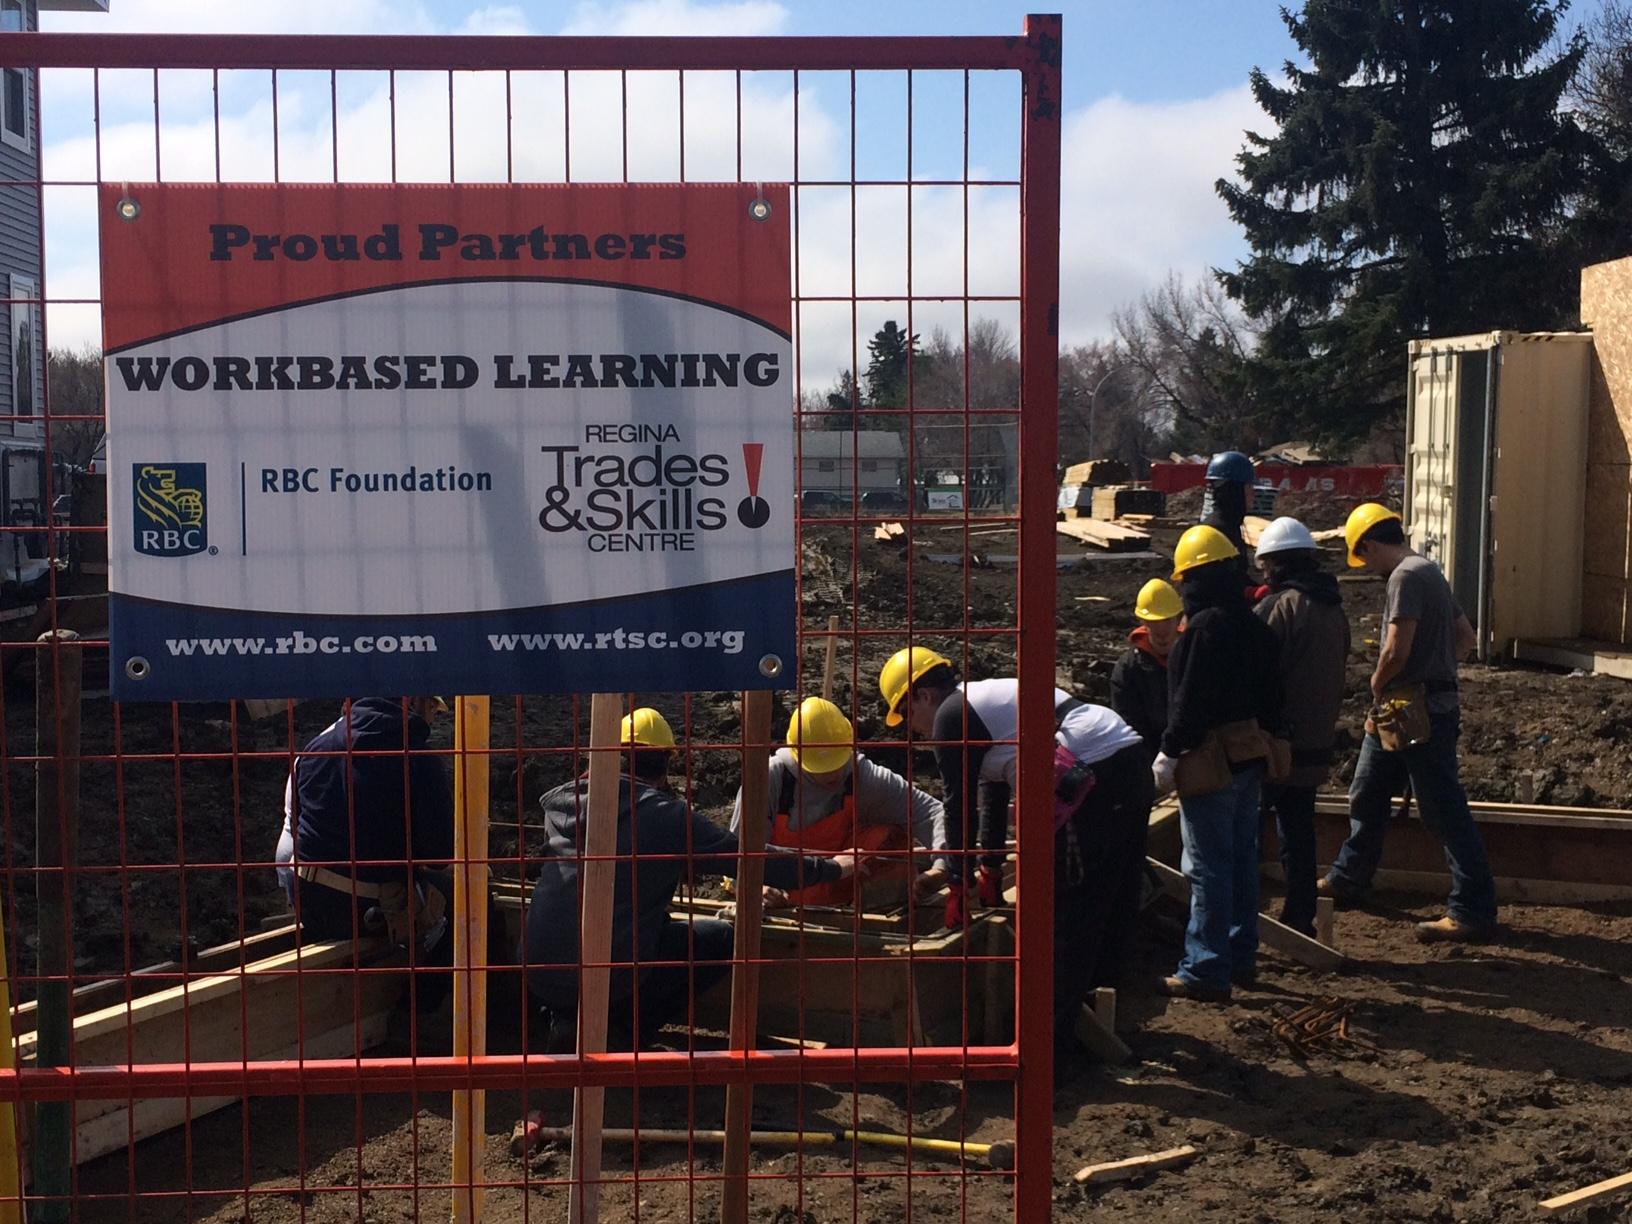 Regina Trades & Skills Centre receives $35,000 grant